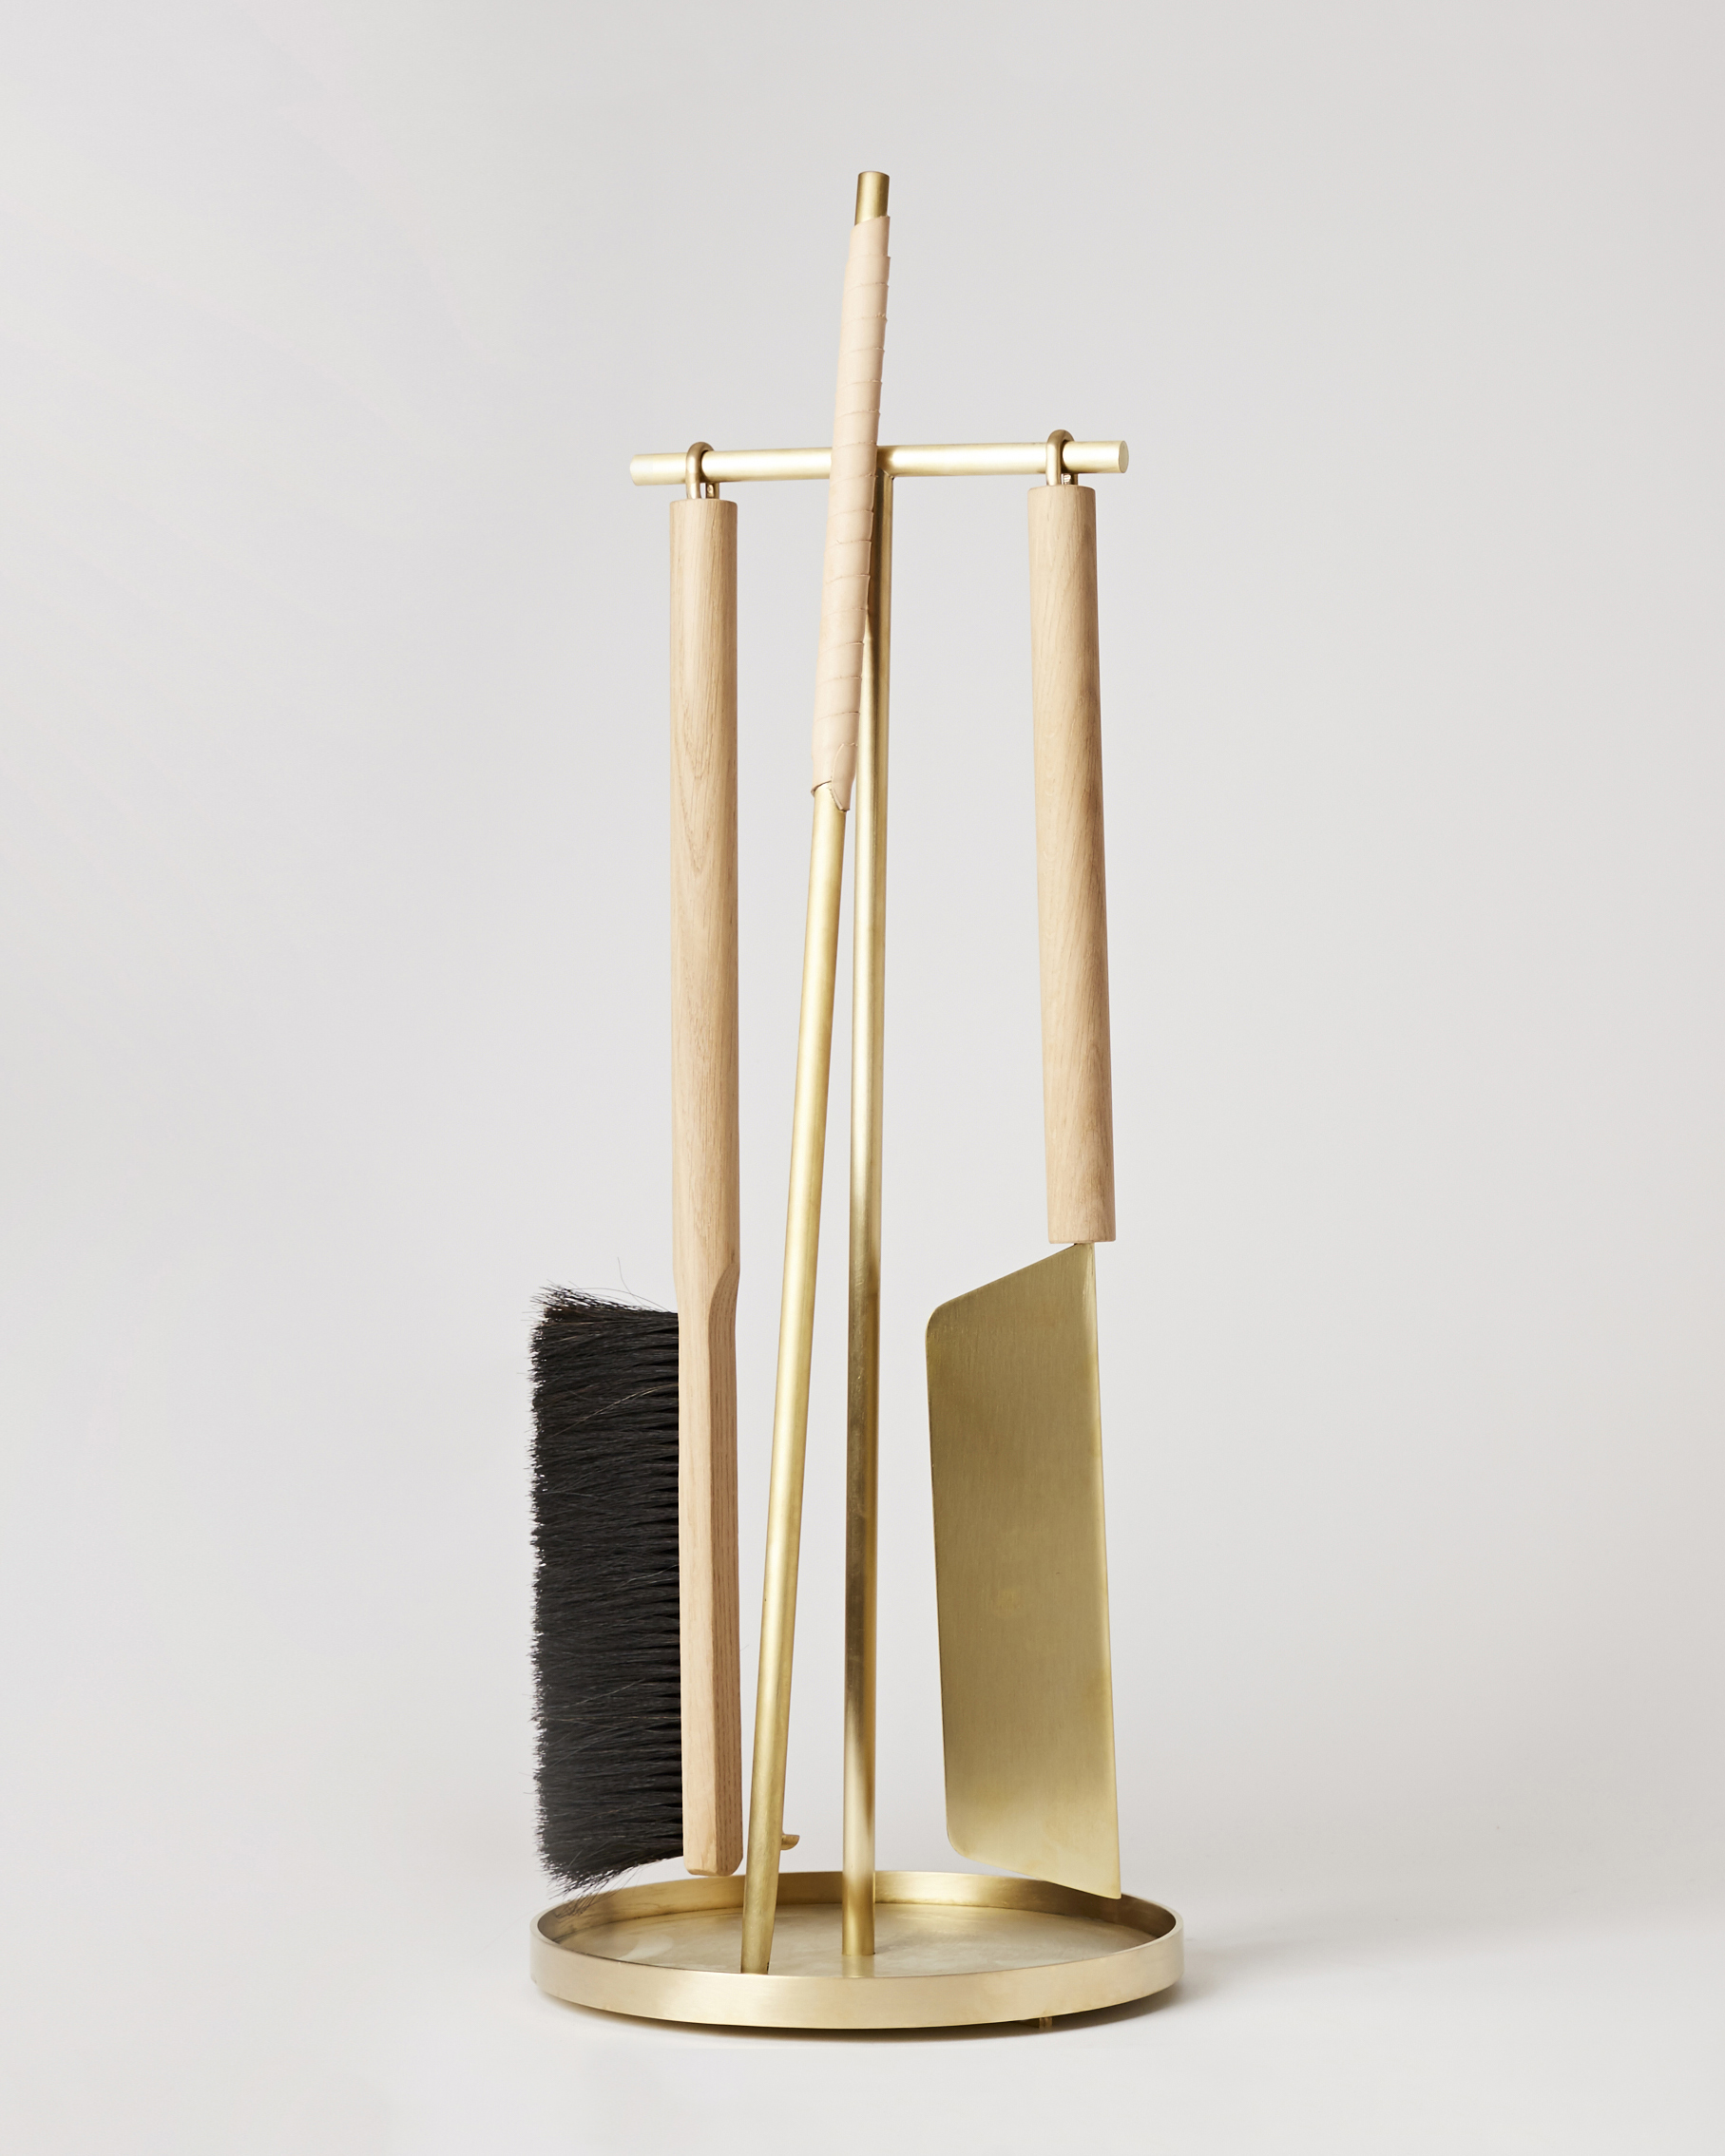 Thom Fougere Mjolk Fire Tools